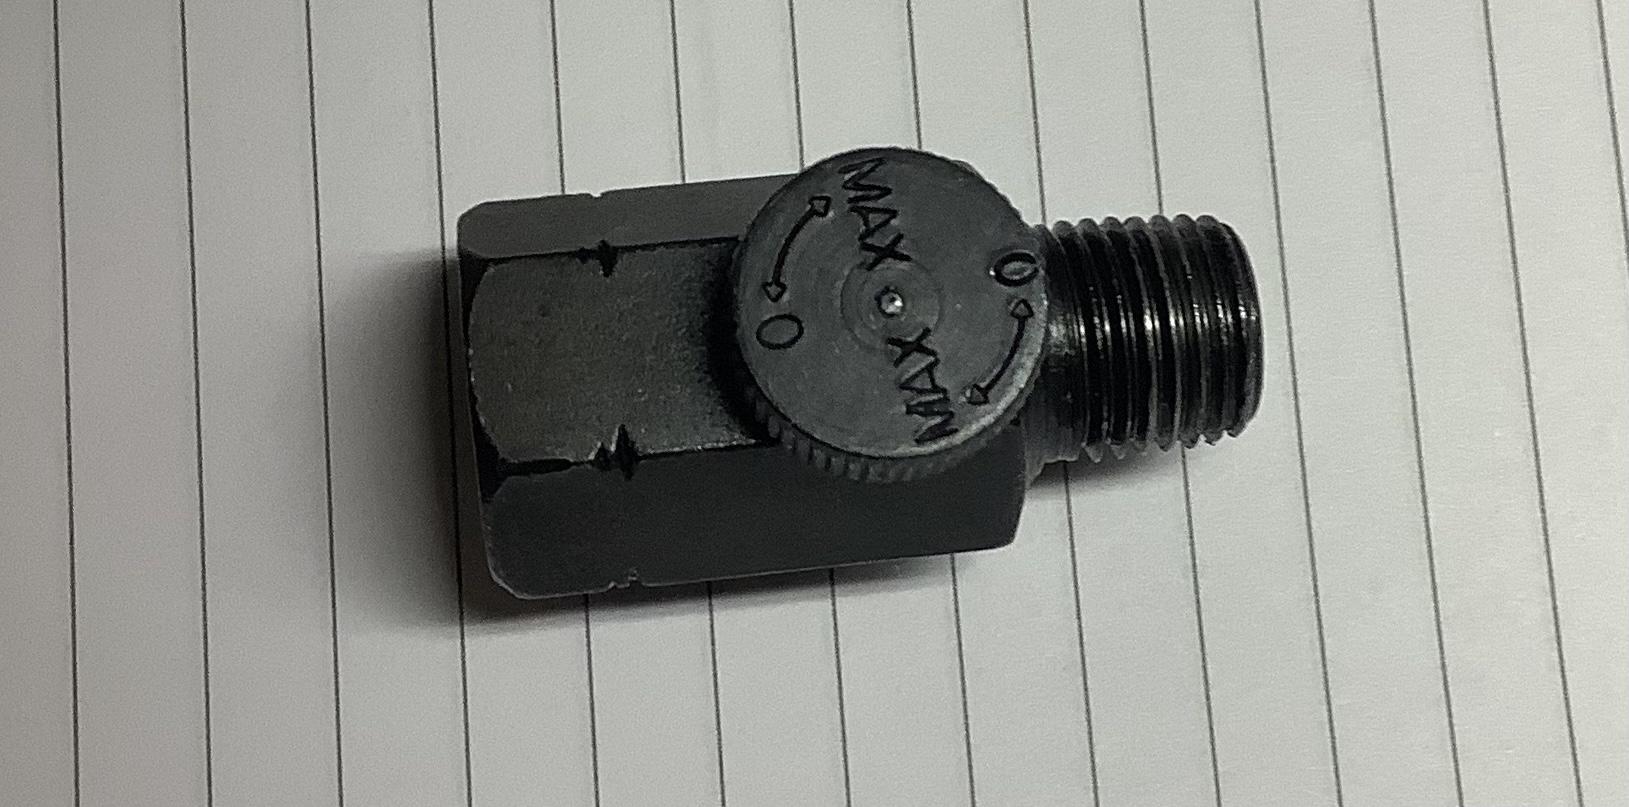 AE413033-48AD-4F16-A758-FE779134D662.jpeg